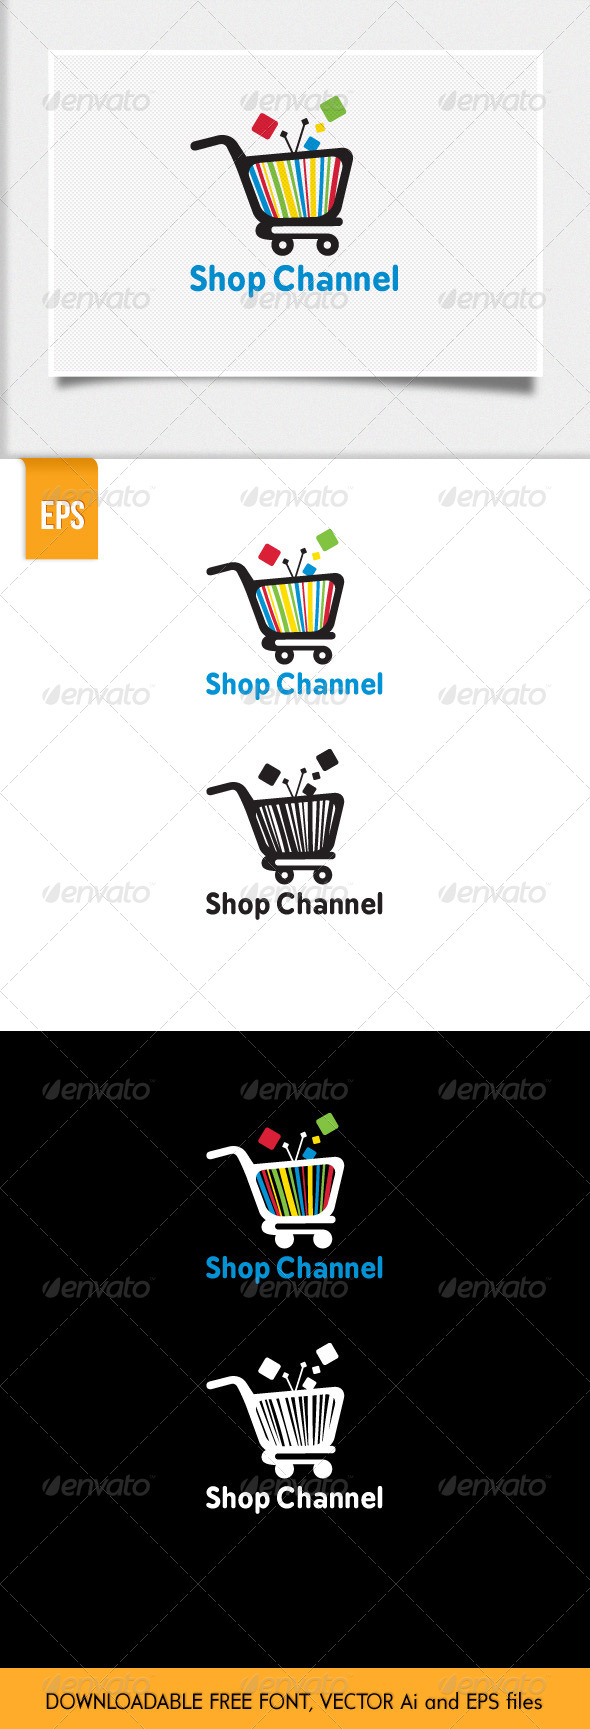 GraphicRiver Shop Channel Logo Template 7104405